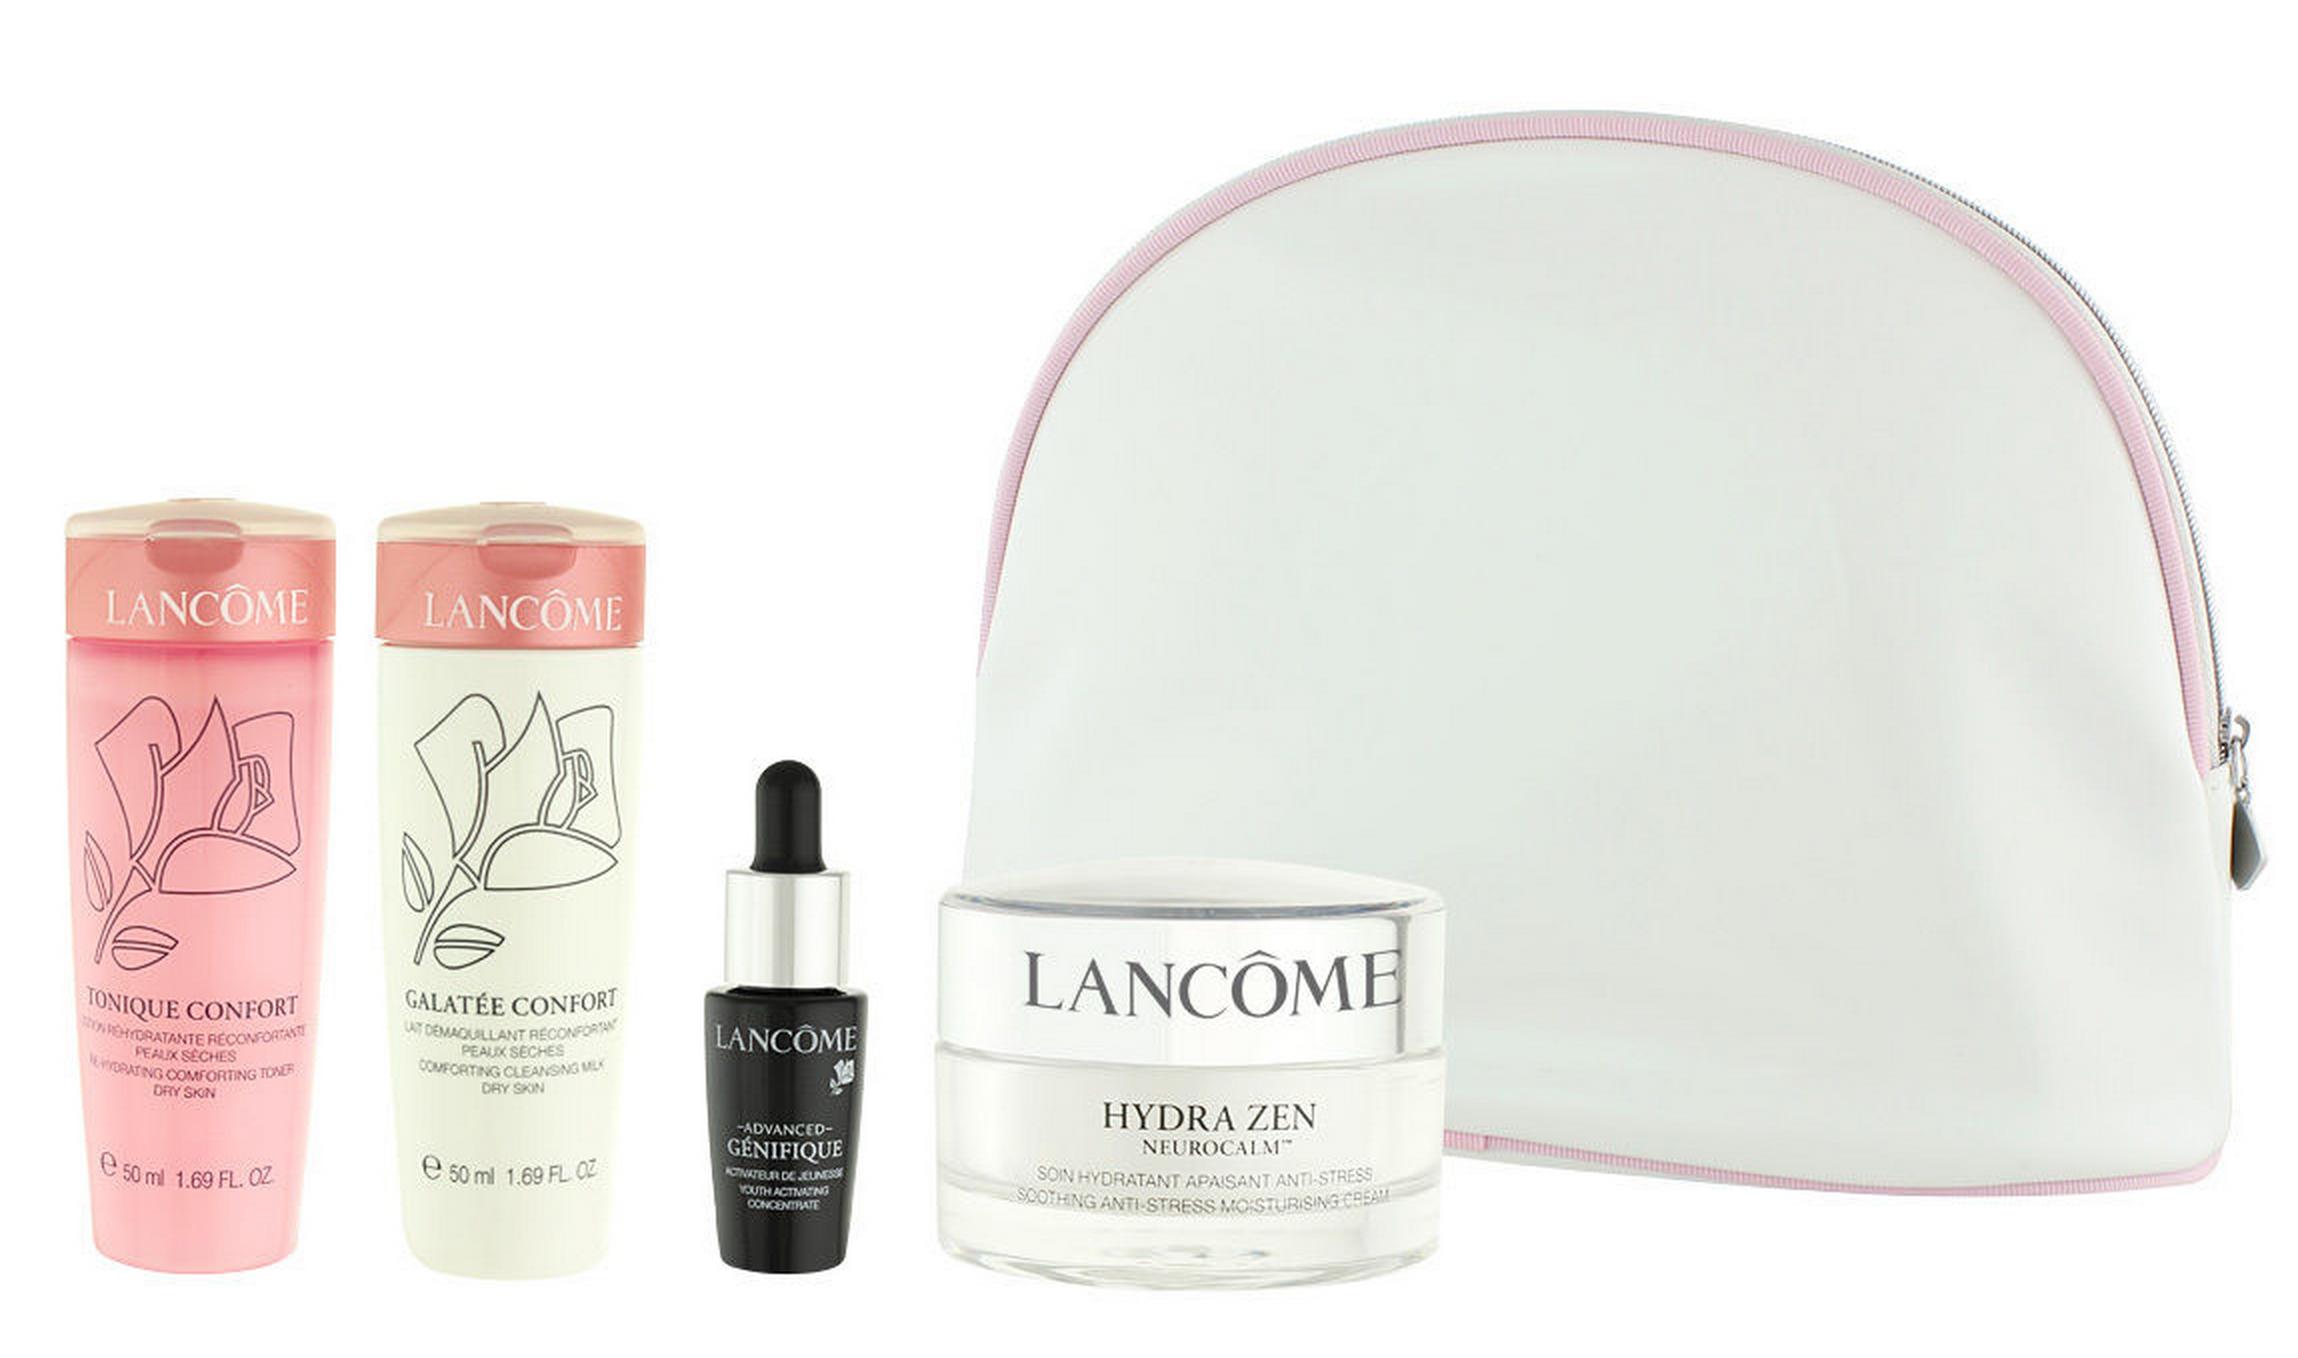 Lancme Hydra Zen Cosmetic Set 50 Ml 7 30 2295 Anti Stress Moisturising Cream Gel 50ml